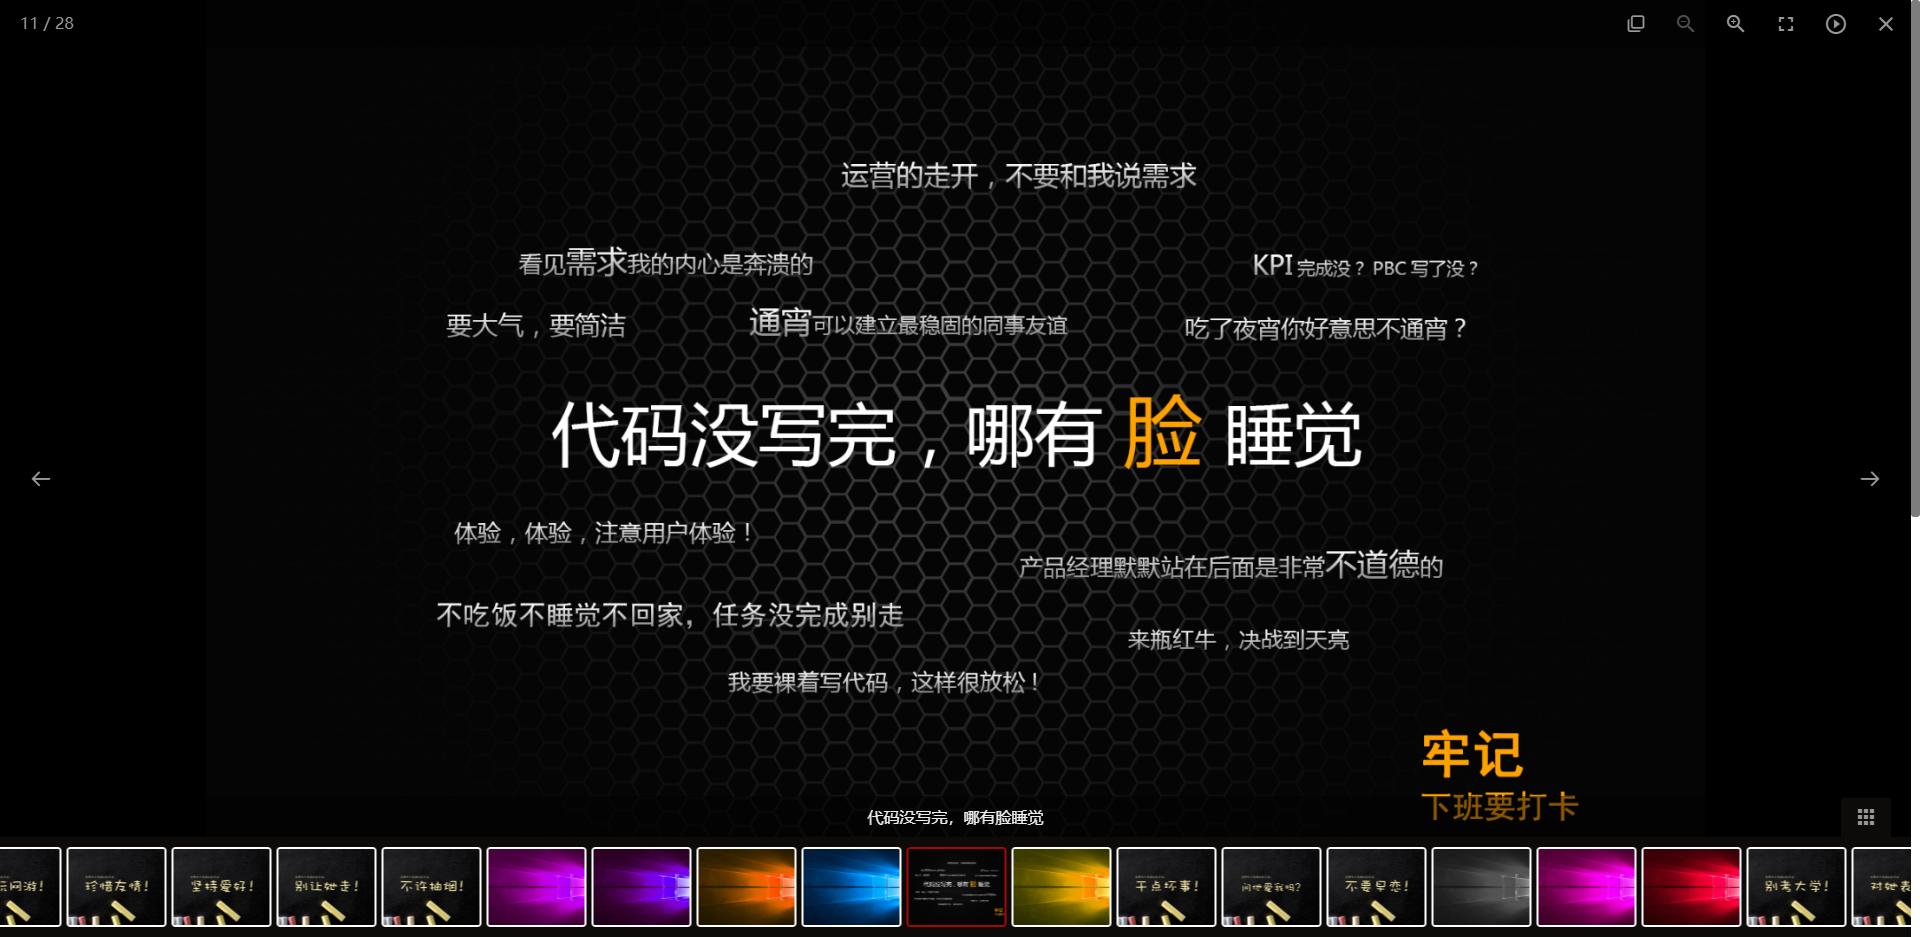 QQ空间备份-相片详情